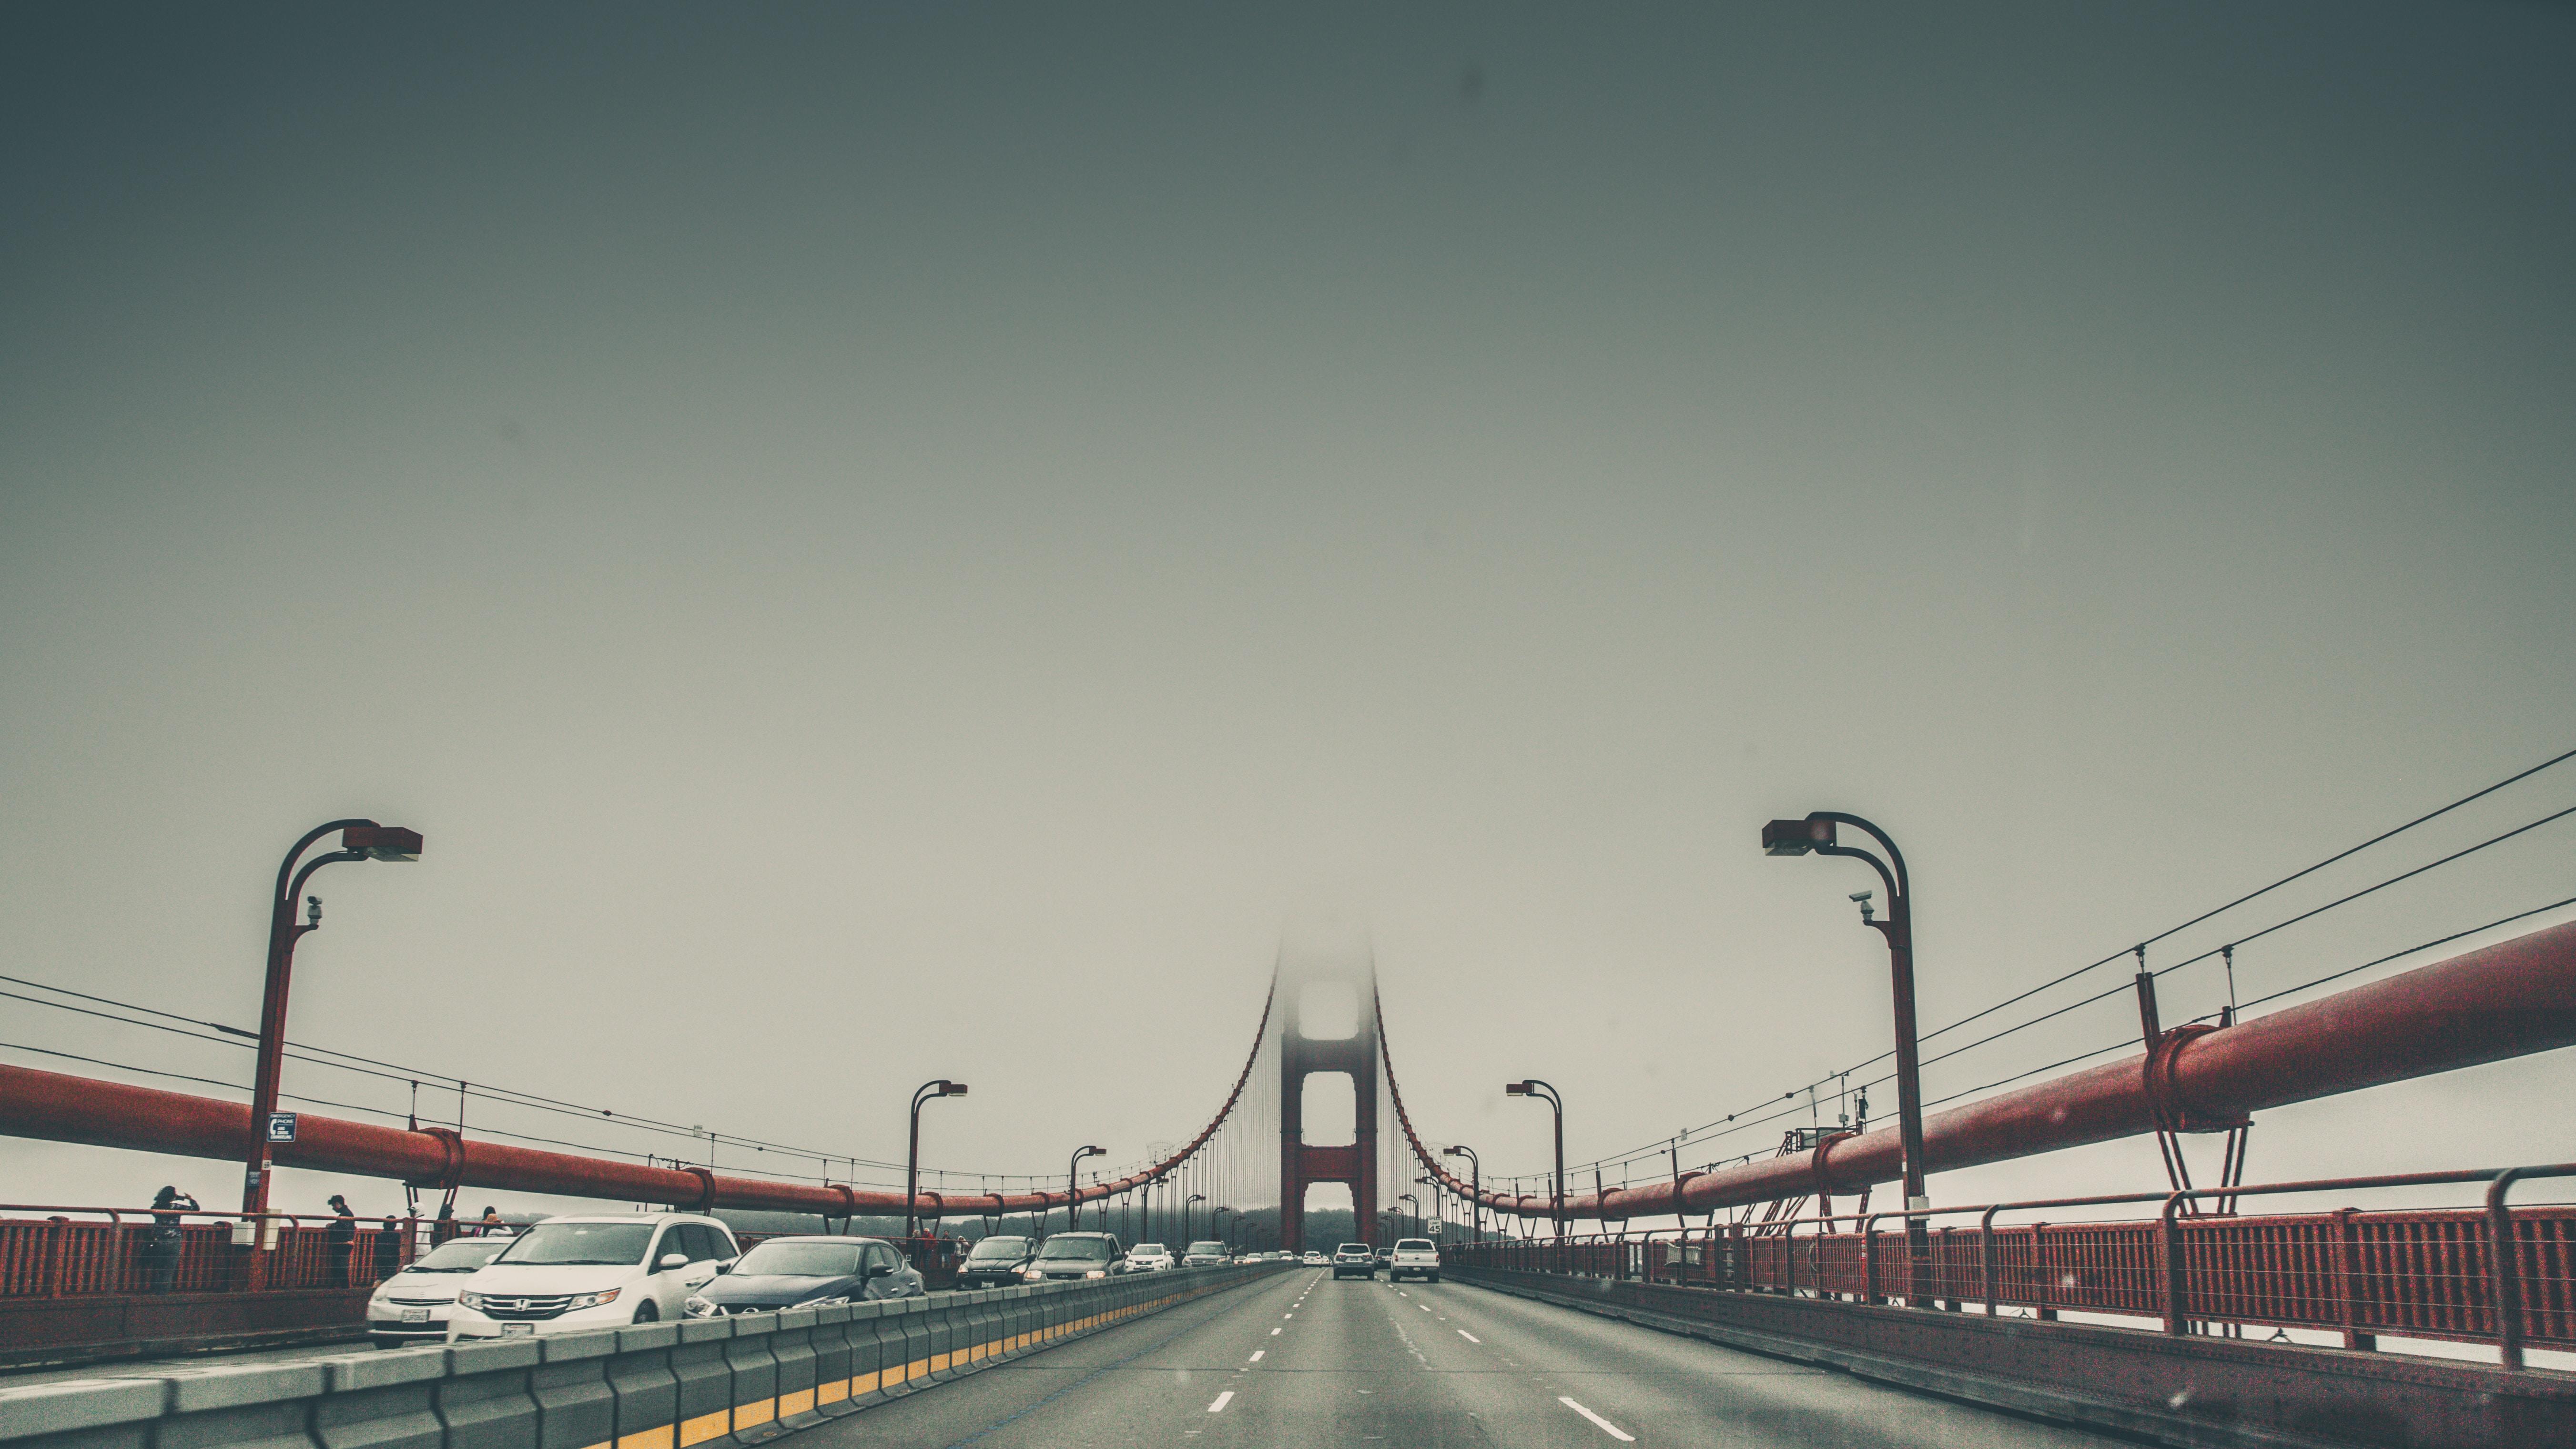 Driving POV on suspension bridge.